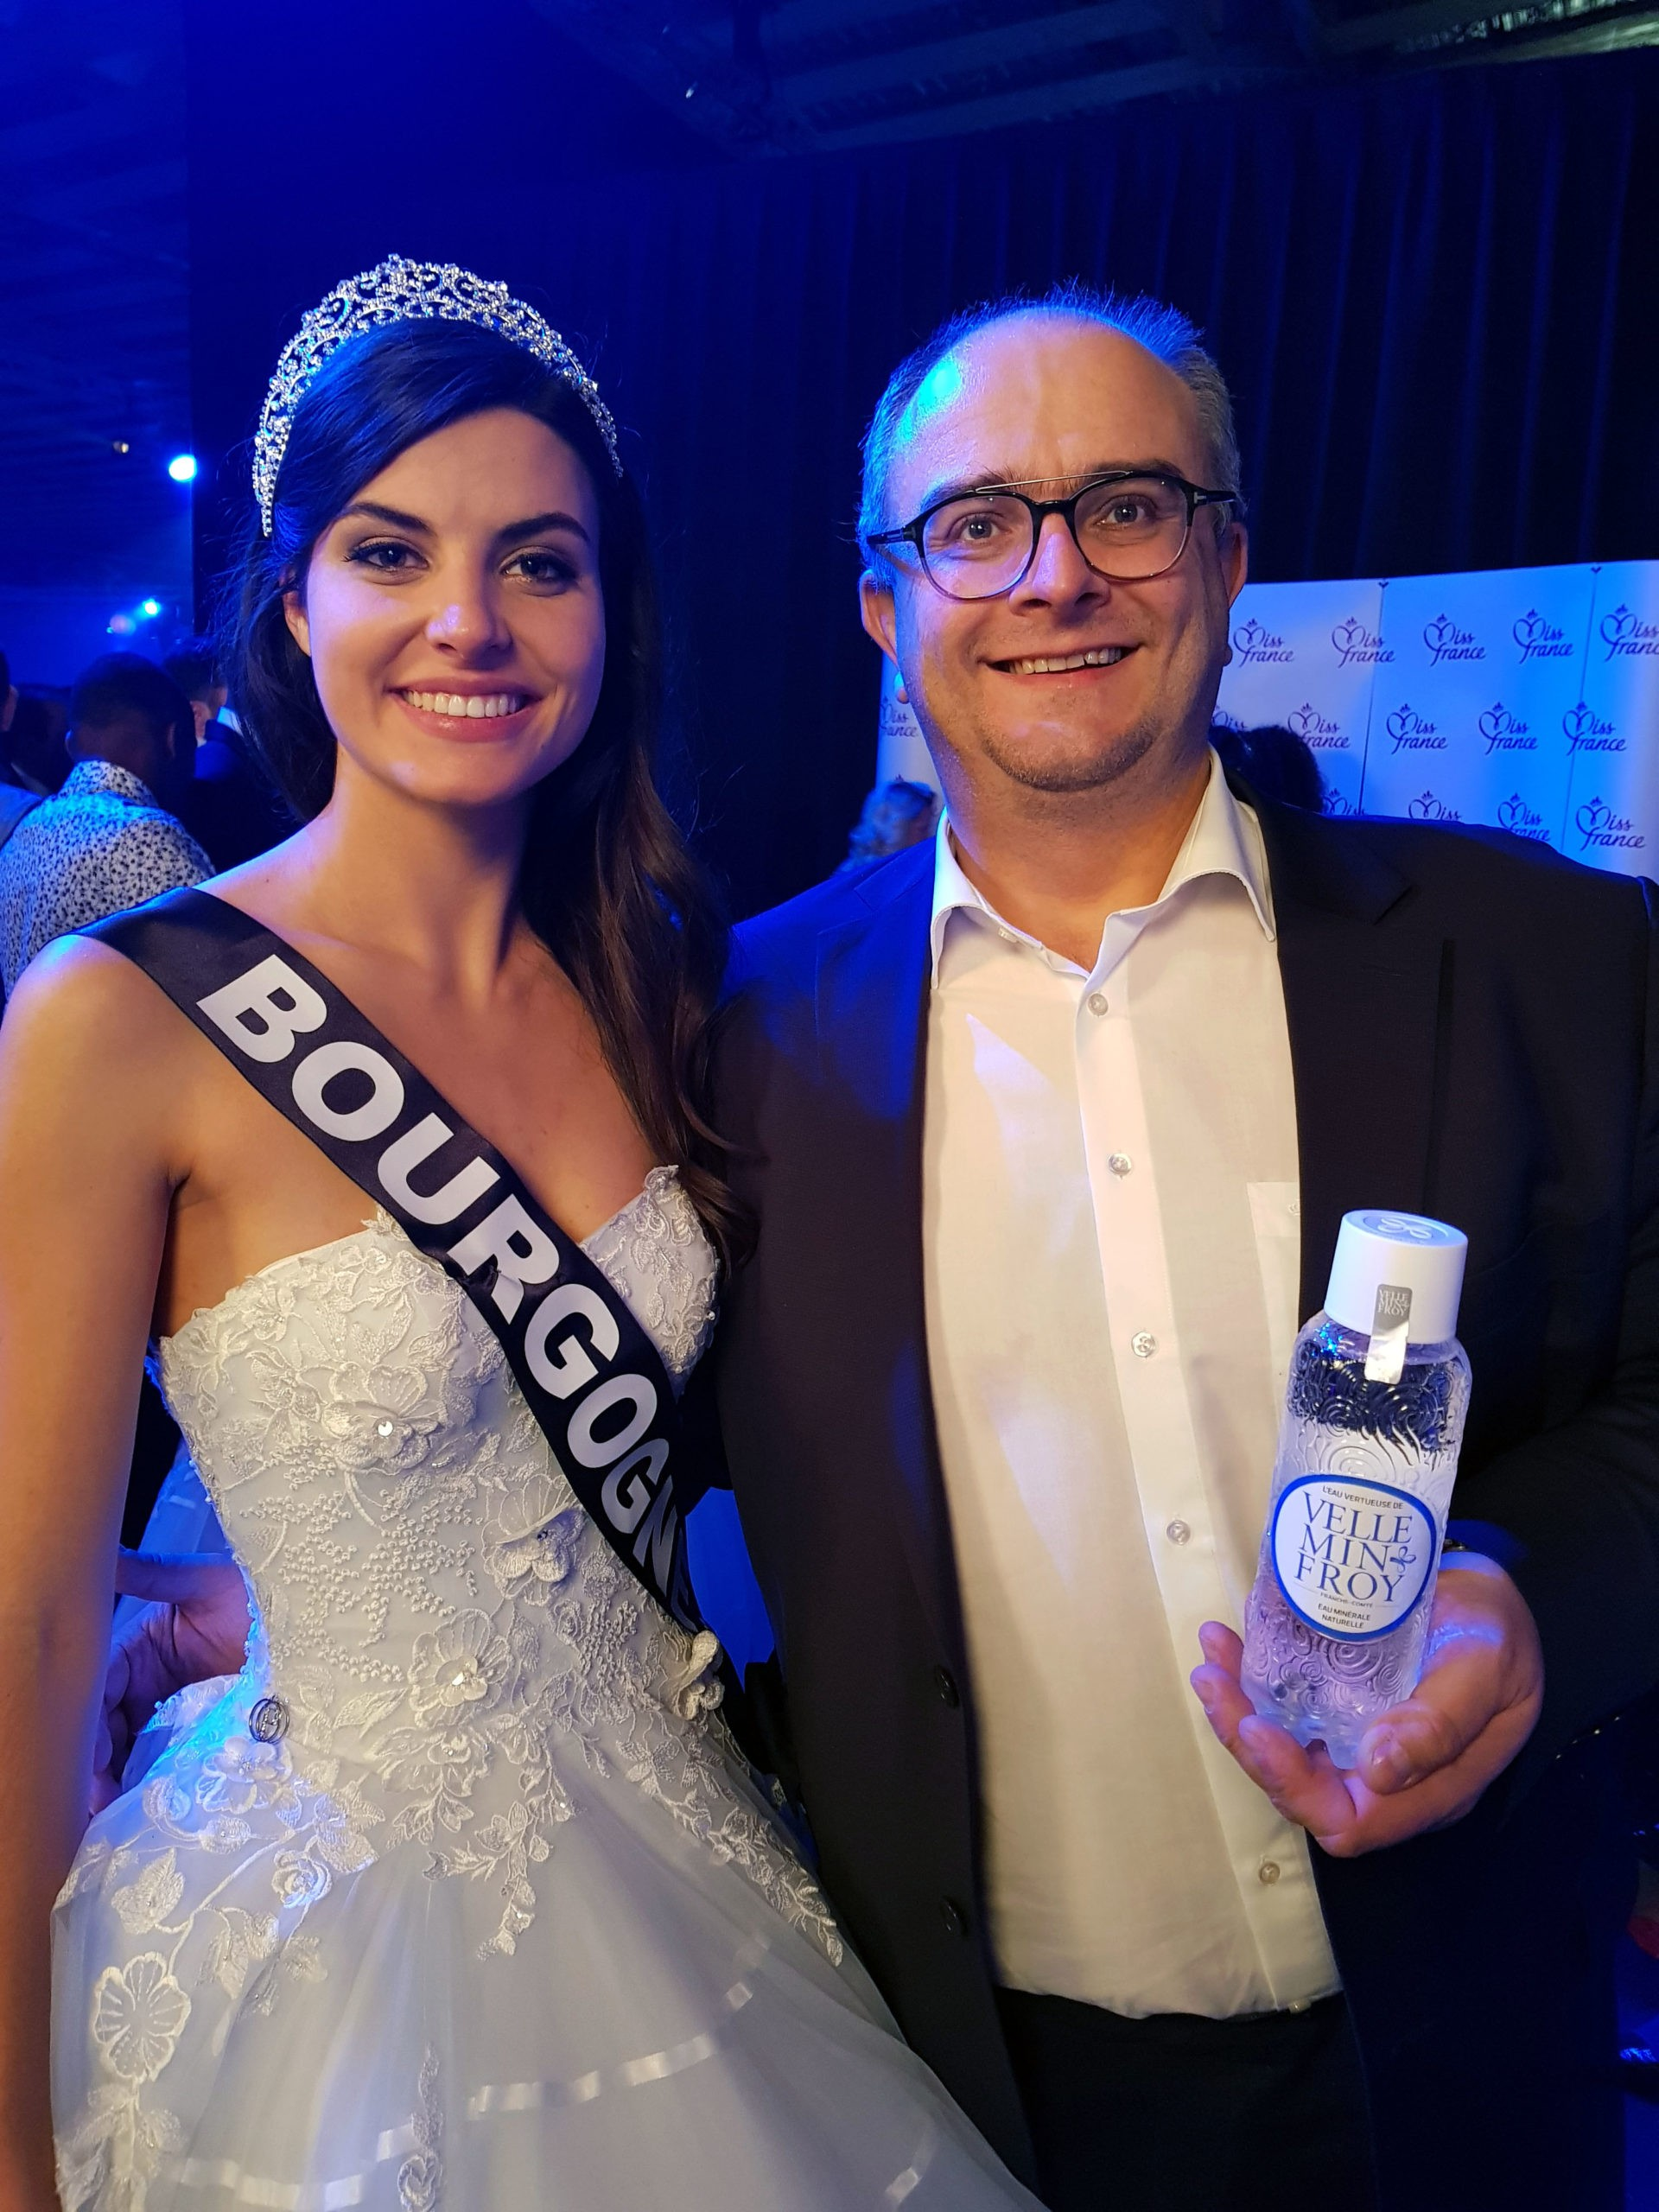 Miss bourgogne 2018 Coline Tourret